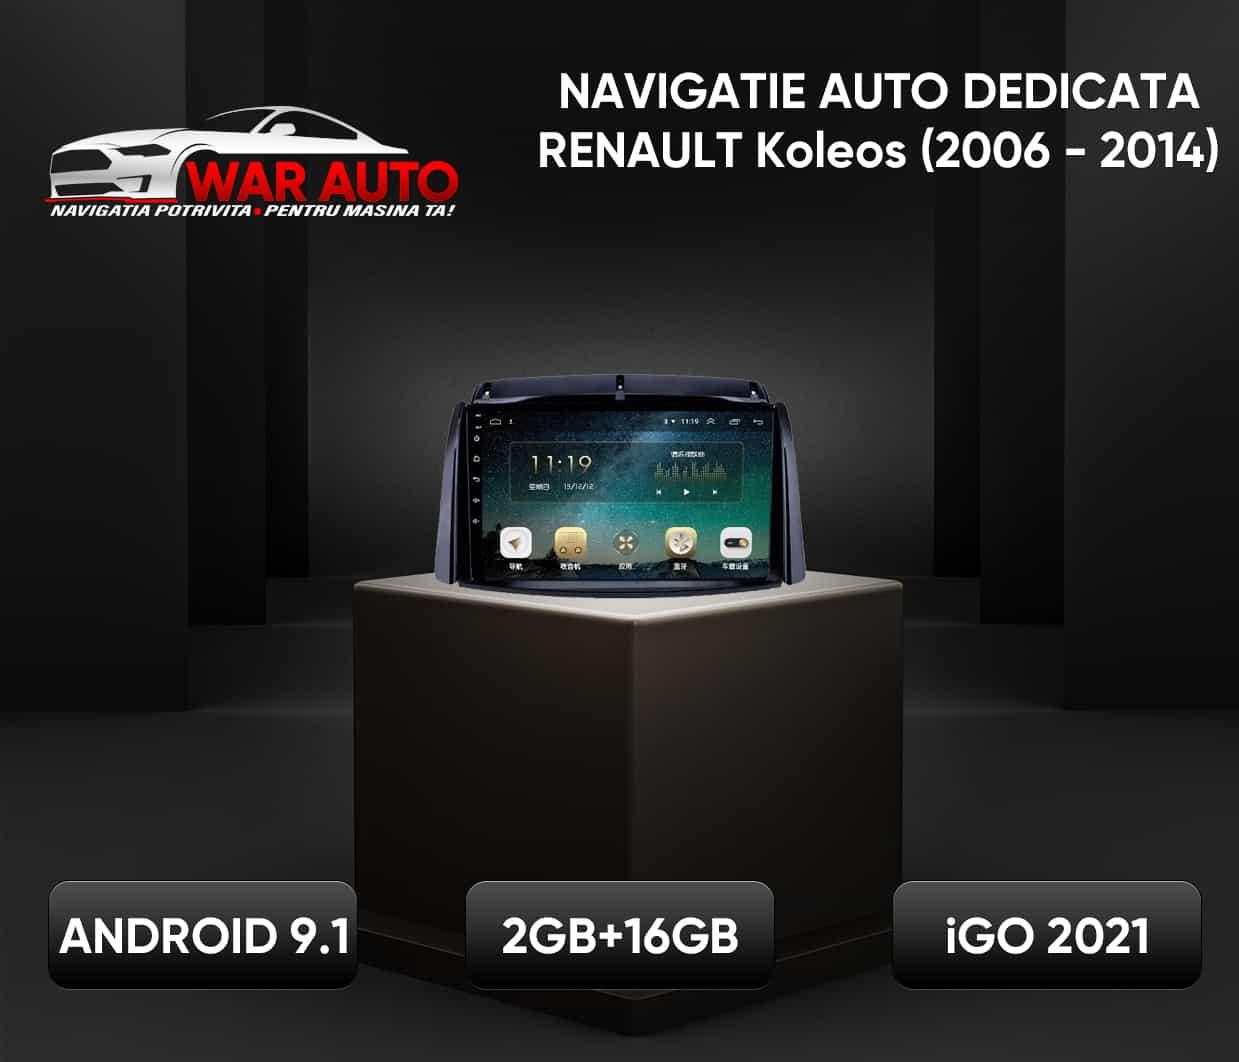 Navigatie Auto Dedicata Renault Koleos 7 inch